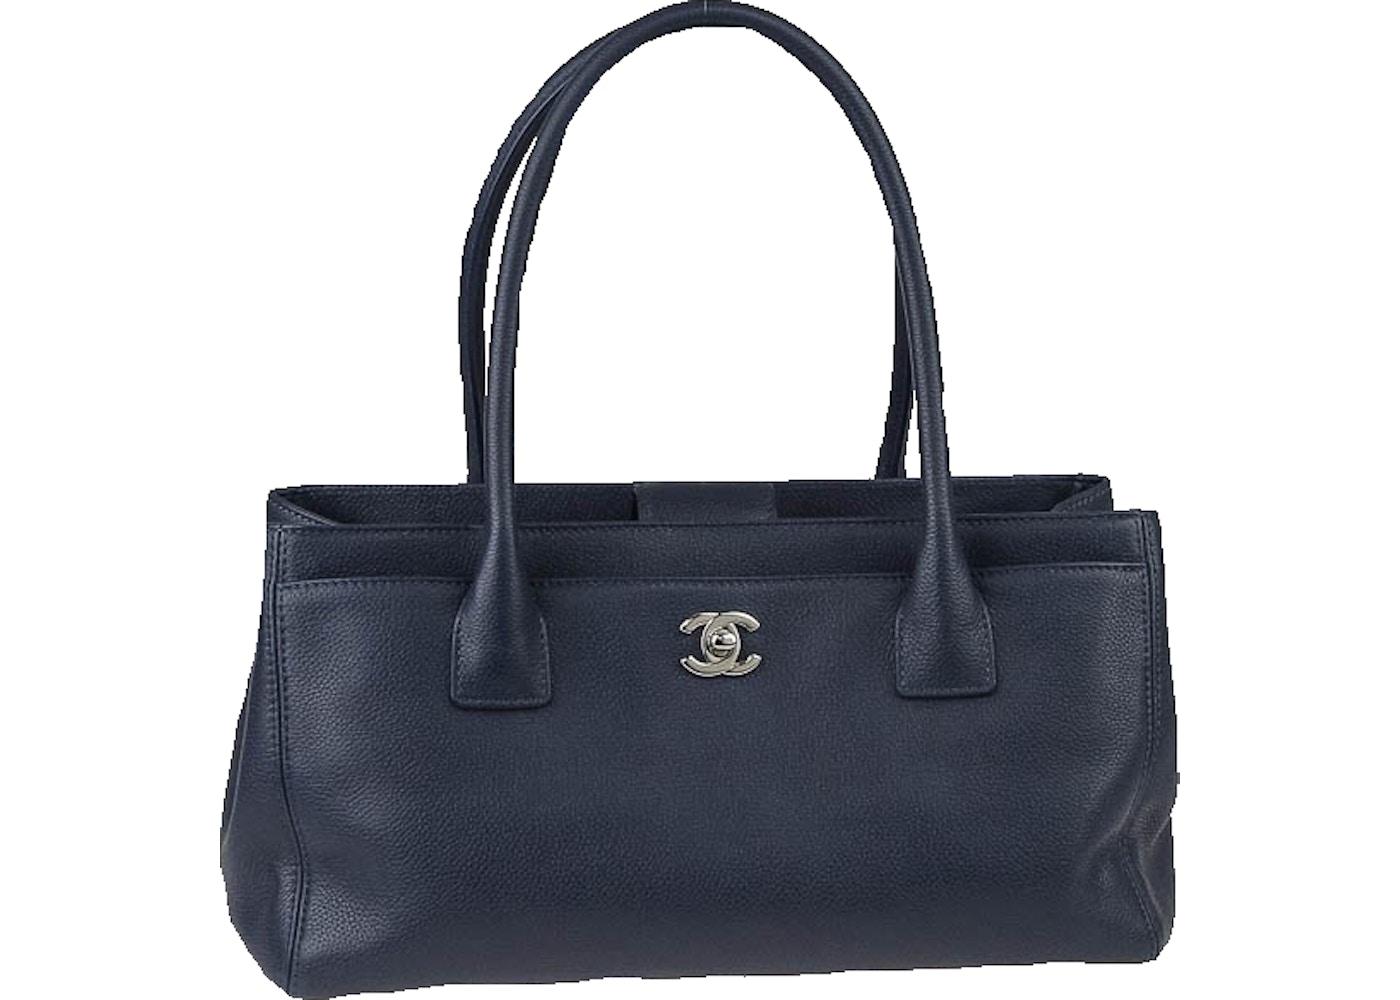 db673bbff5 Buy & Sell Chanel Other Handbags - Last Sale